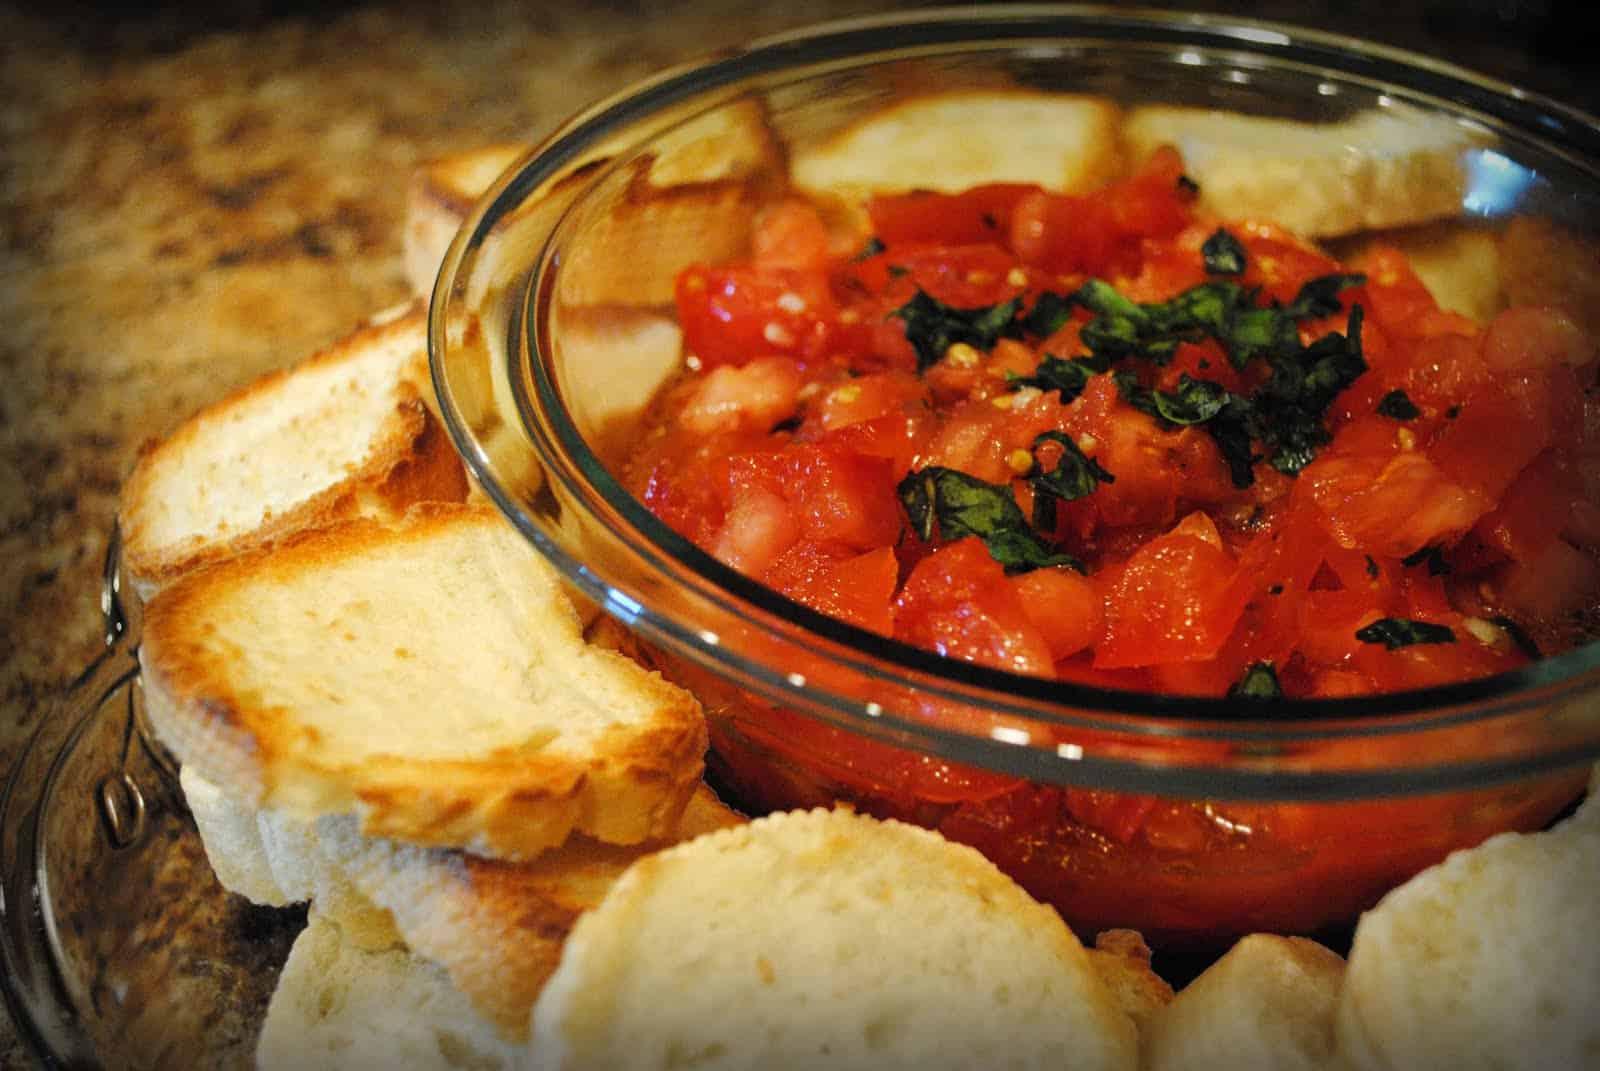 bruschetta al pomodoro - Olive Garden Bruschetta Recipe